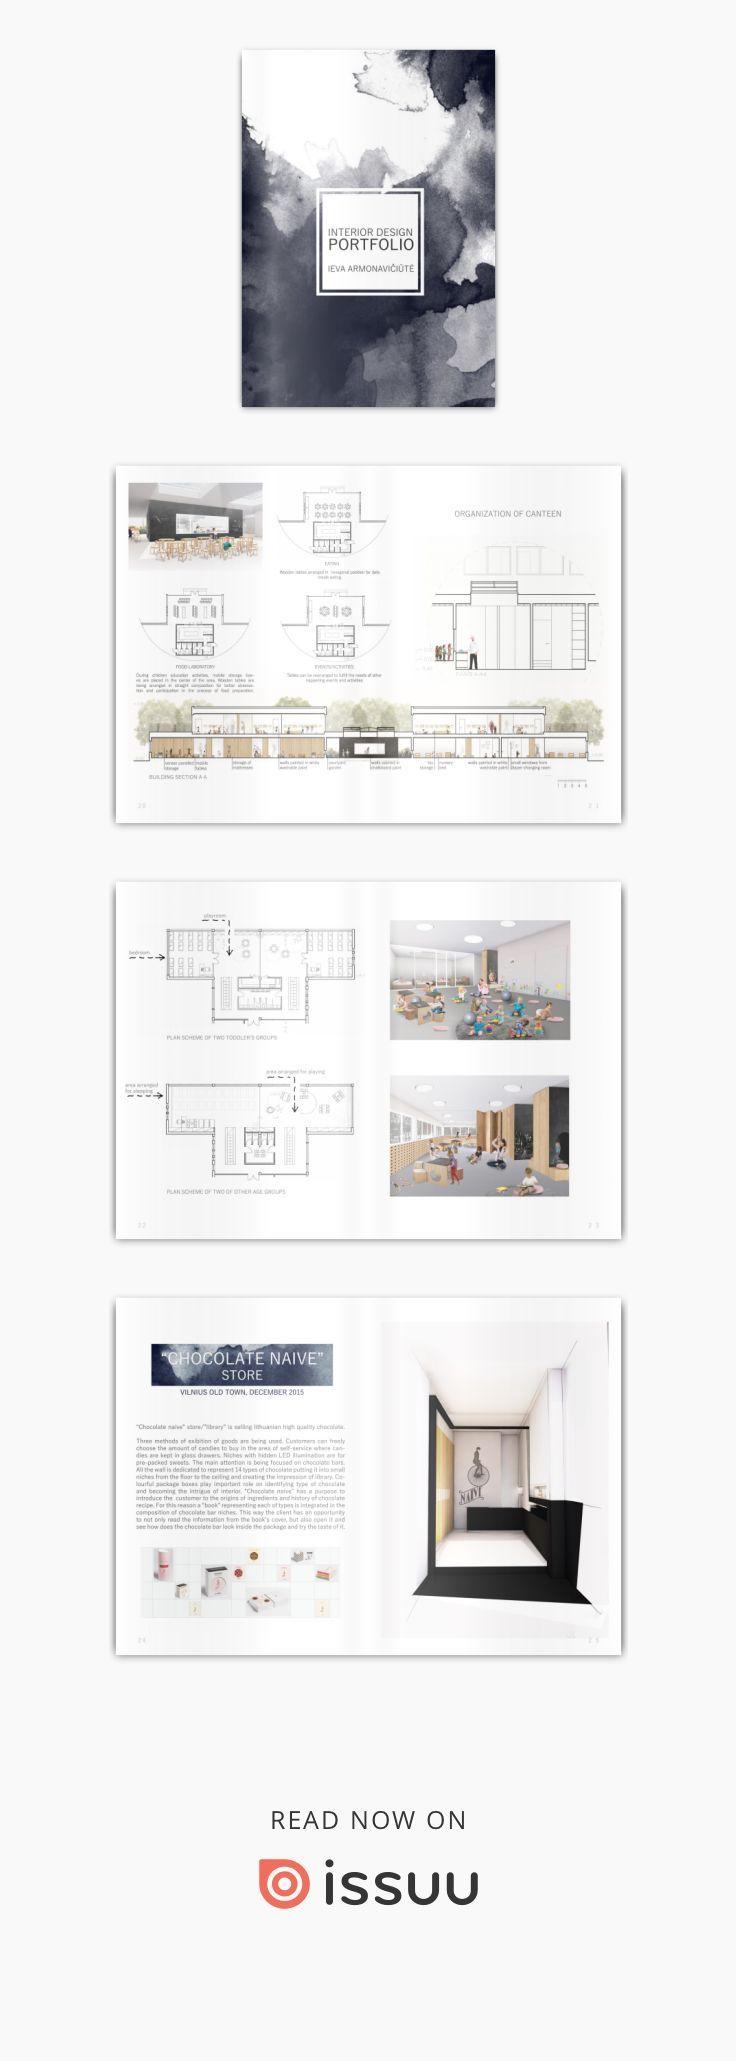 21 Portfoliomappe Ideen   portfolio design, portfolio design ...